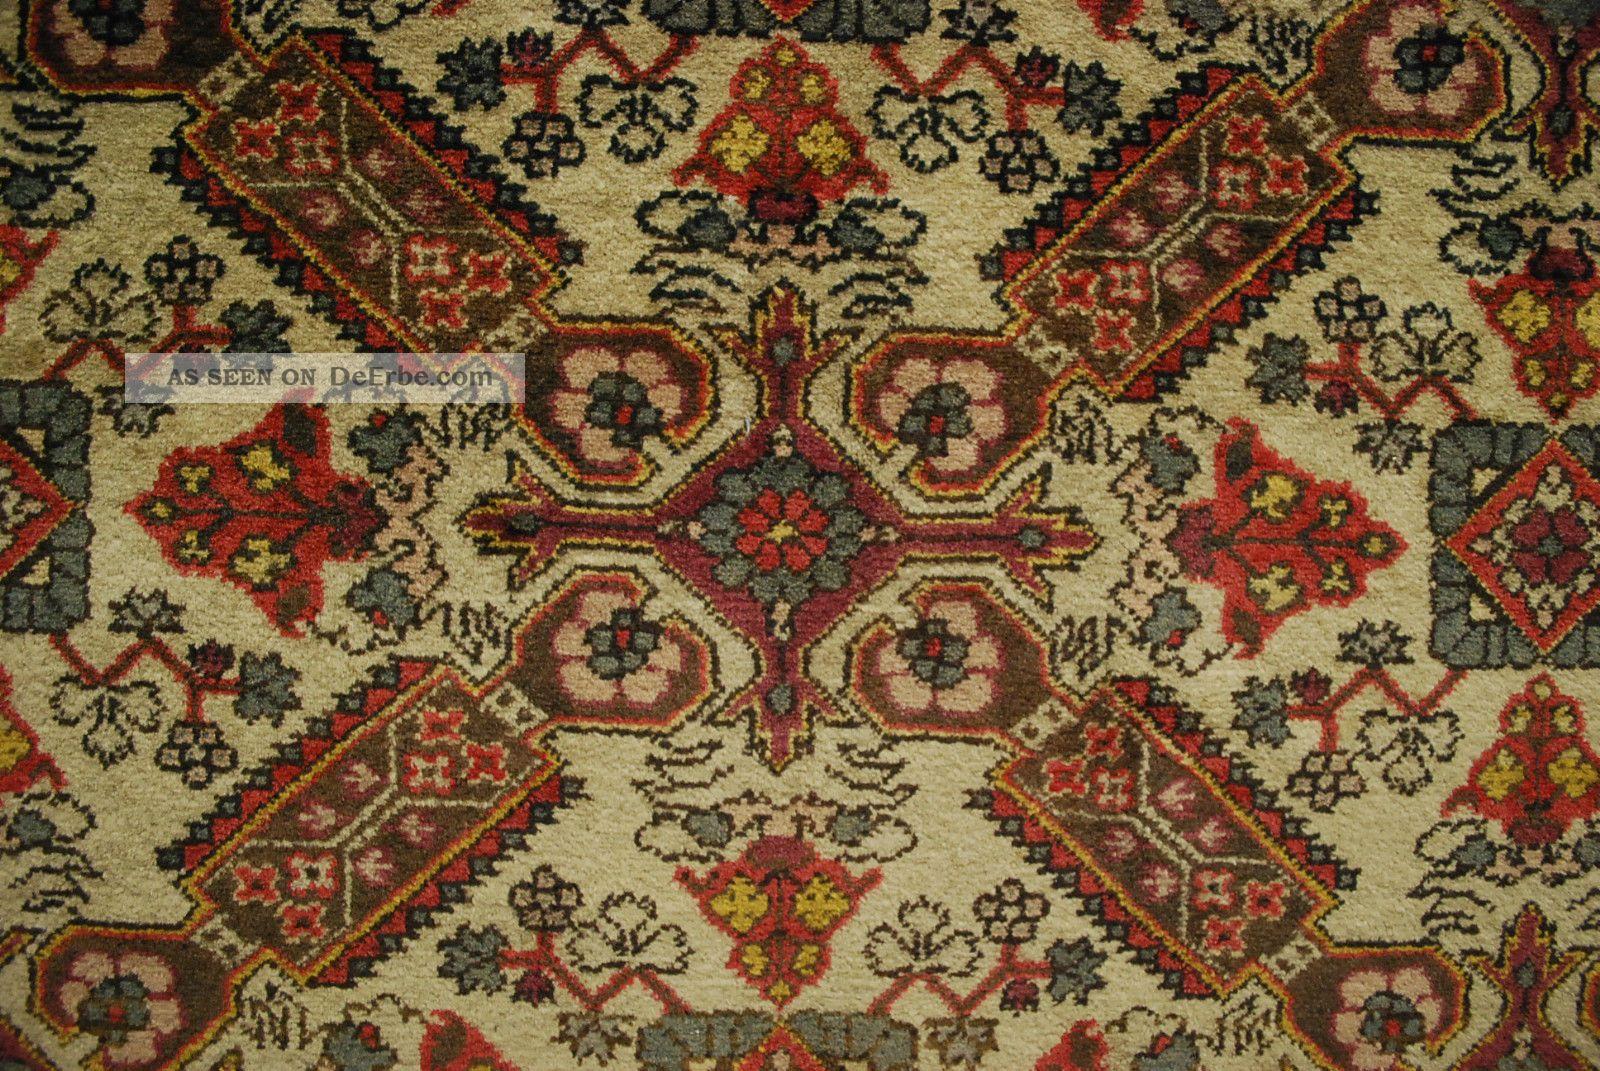 alter derbent schirwan teppich rug tappeto ca 220 x 170 cm 056. Black Bedroom Furniture Sets. Home Design Ideas